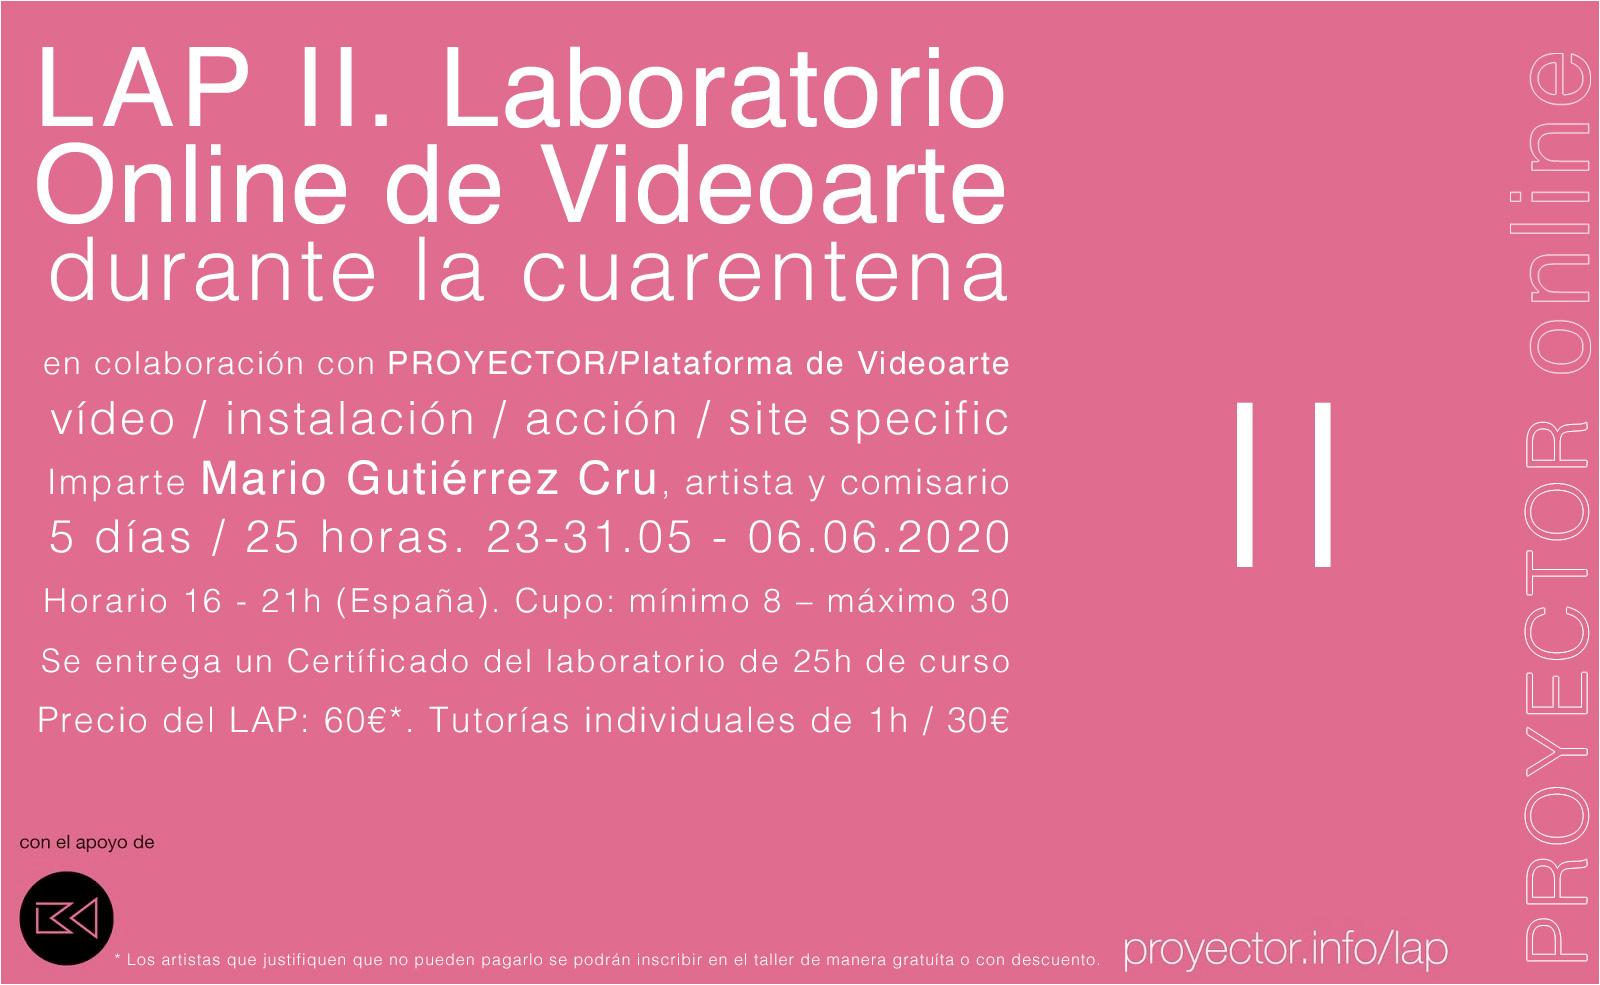 LAP-II-Laboratorio-online-de-videoarte-durante-la-cuarentena